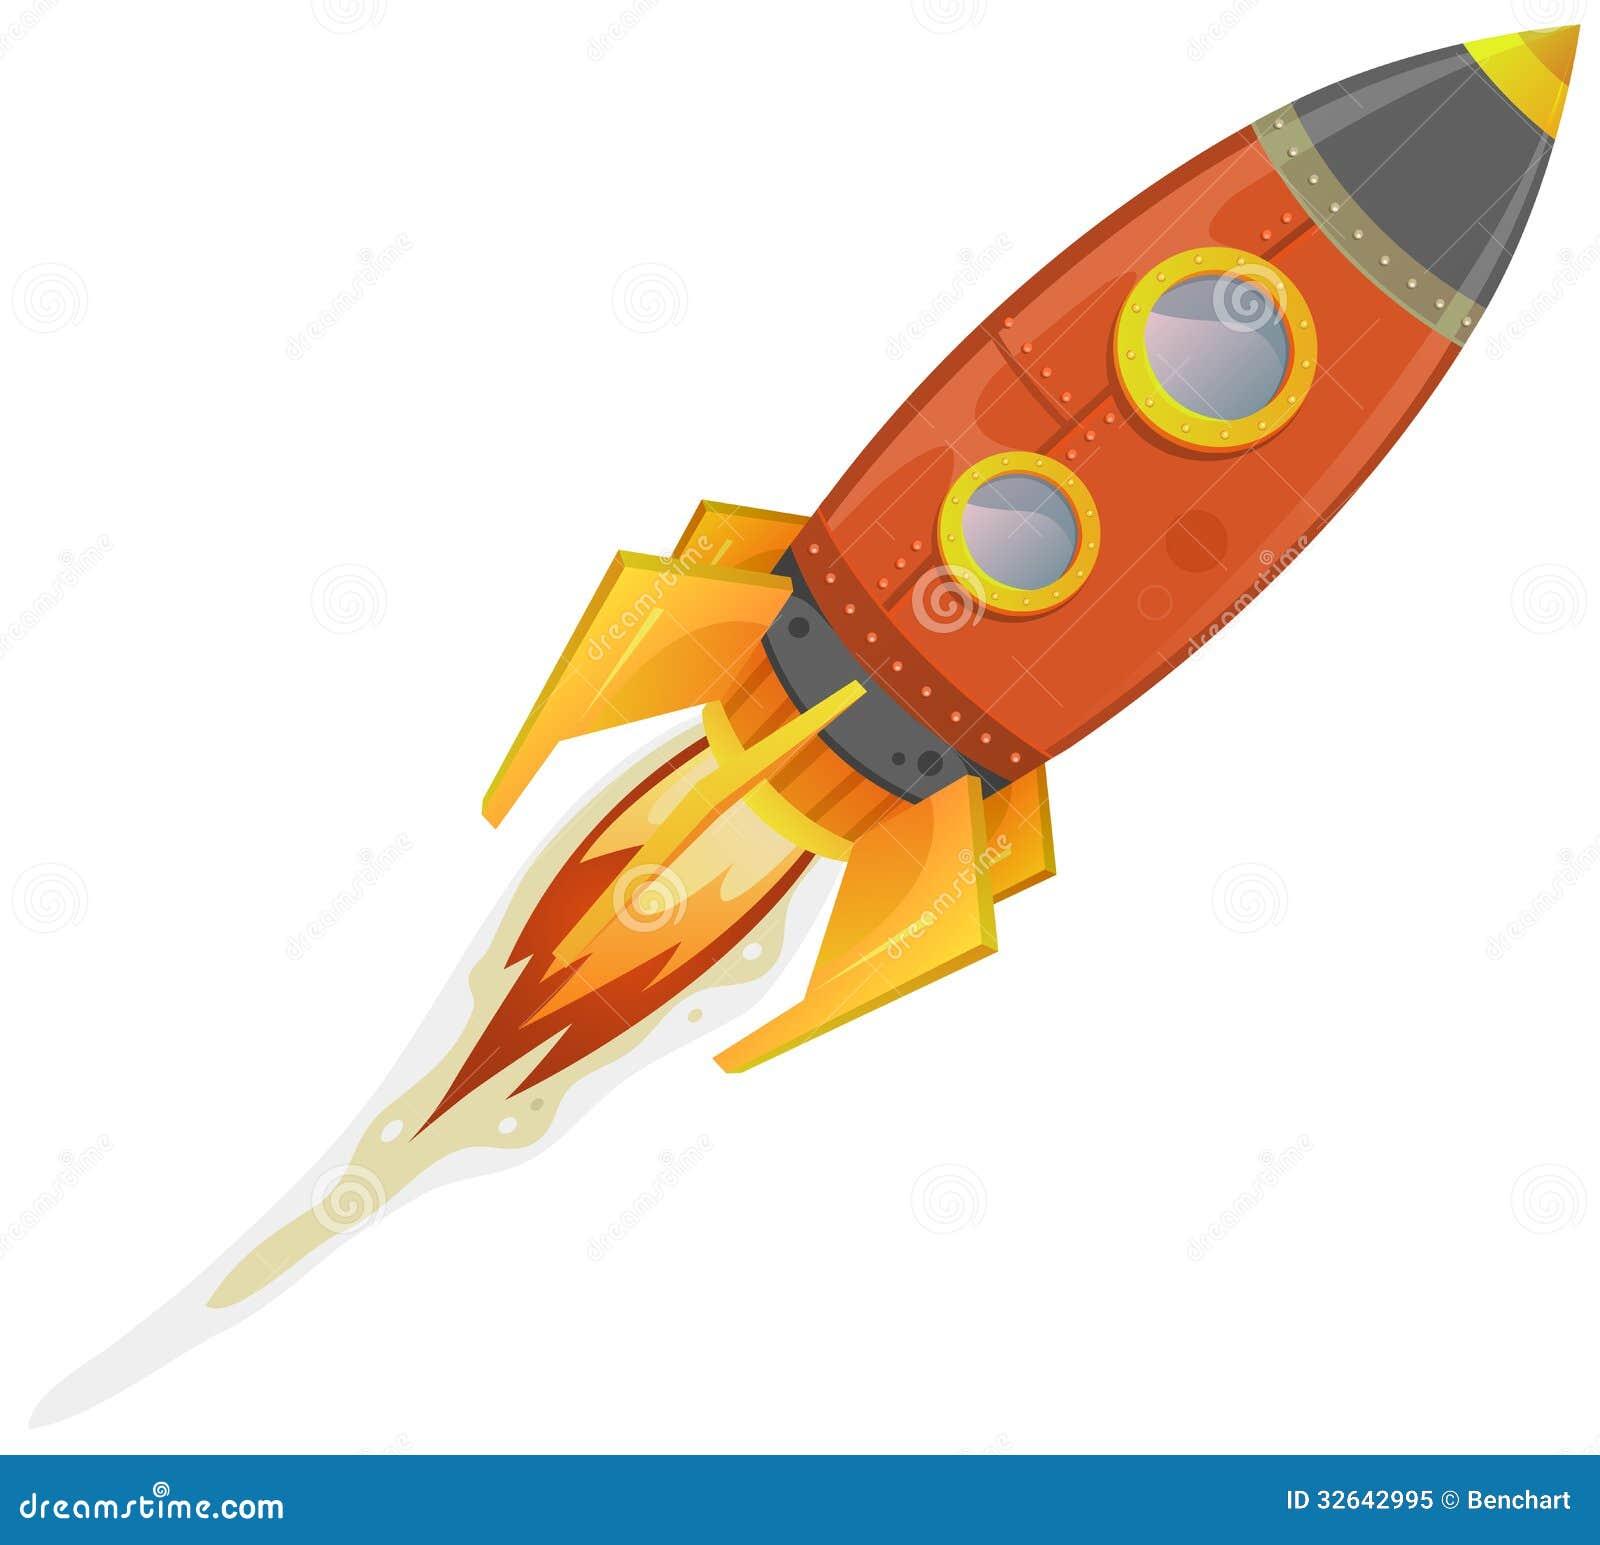 comic rocket ship royalty free stock photo image 32642995 rocket ship clip art free rocket ship clip art no background